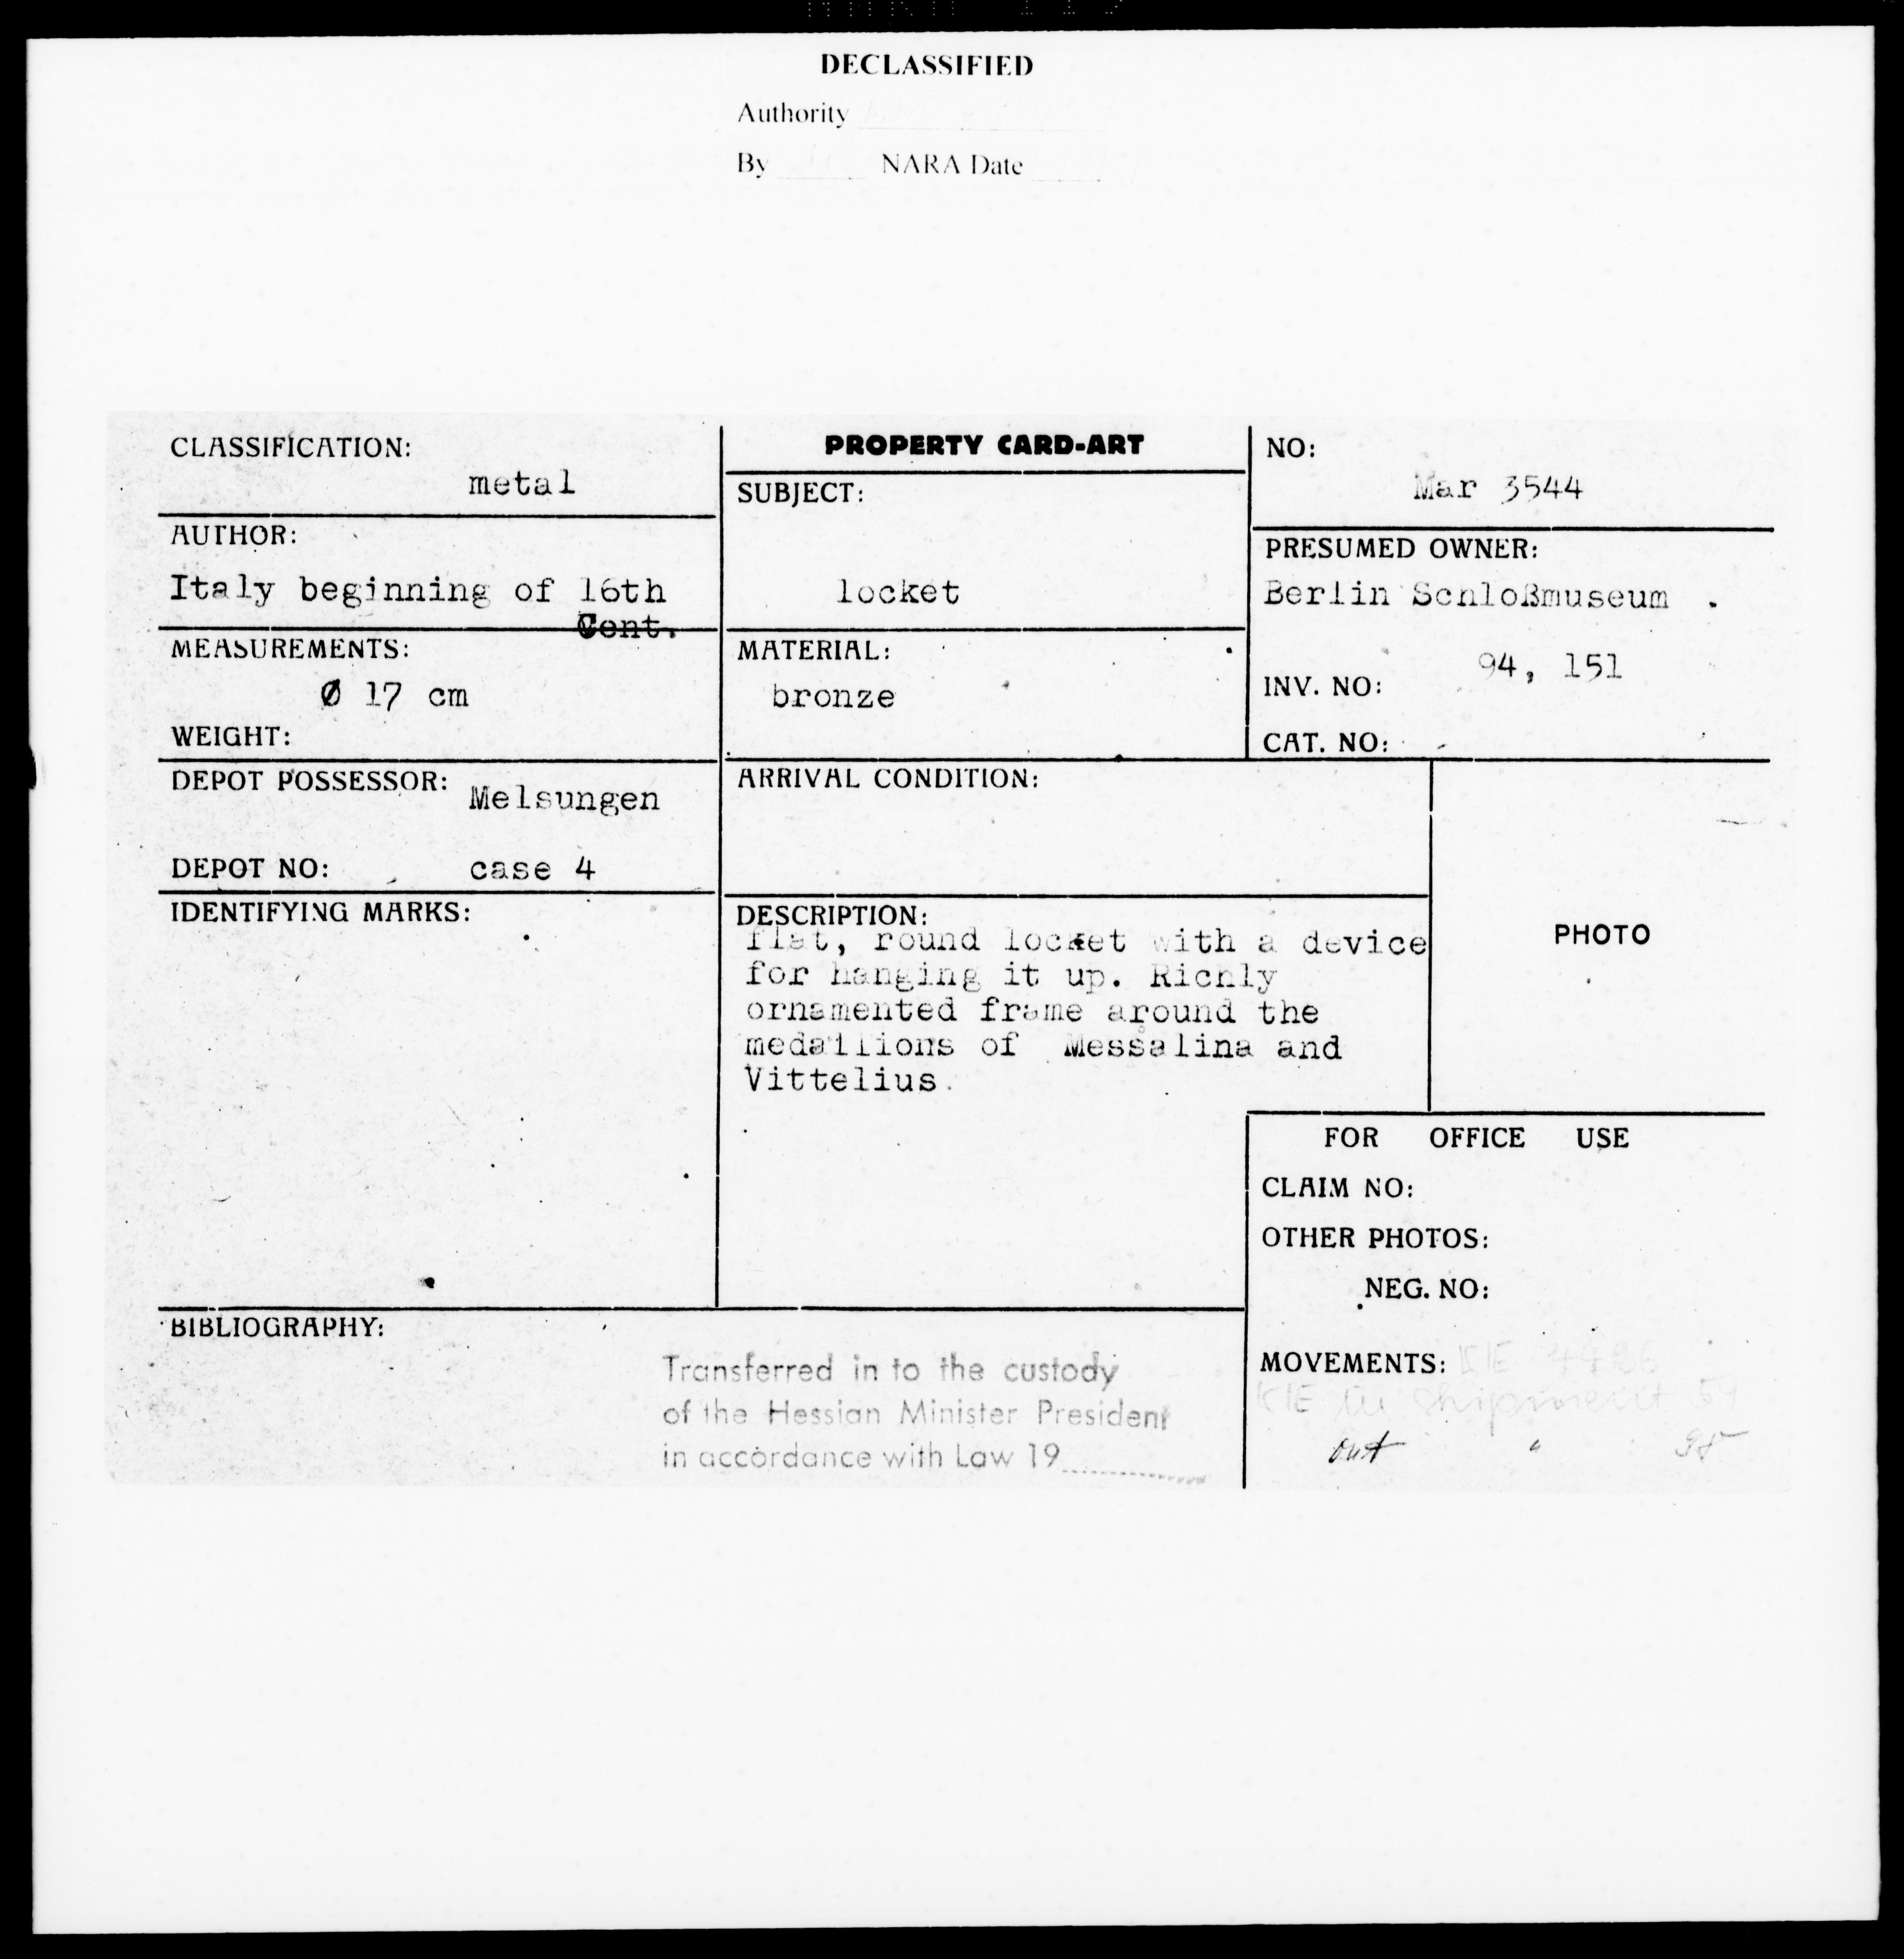 Property Card Mar 3544, Metalwork, Locket